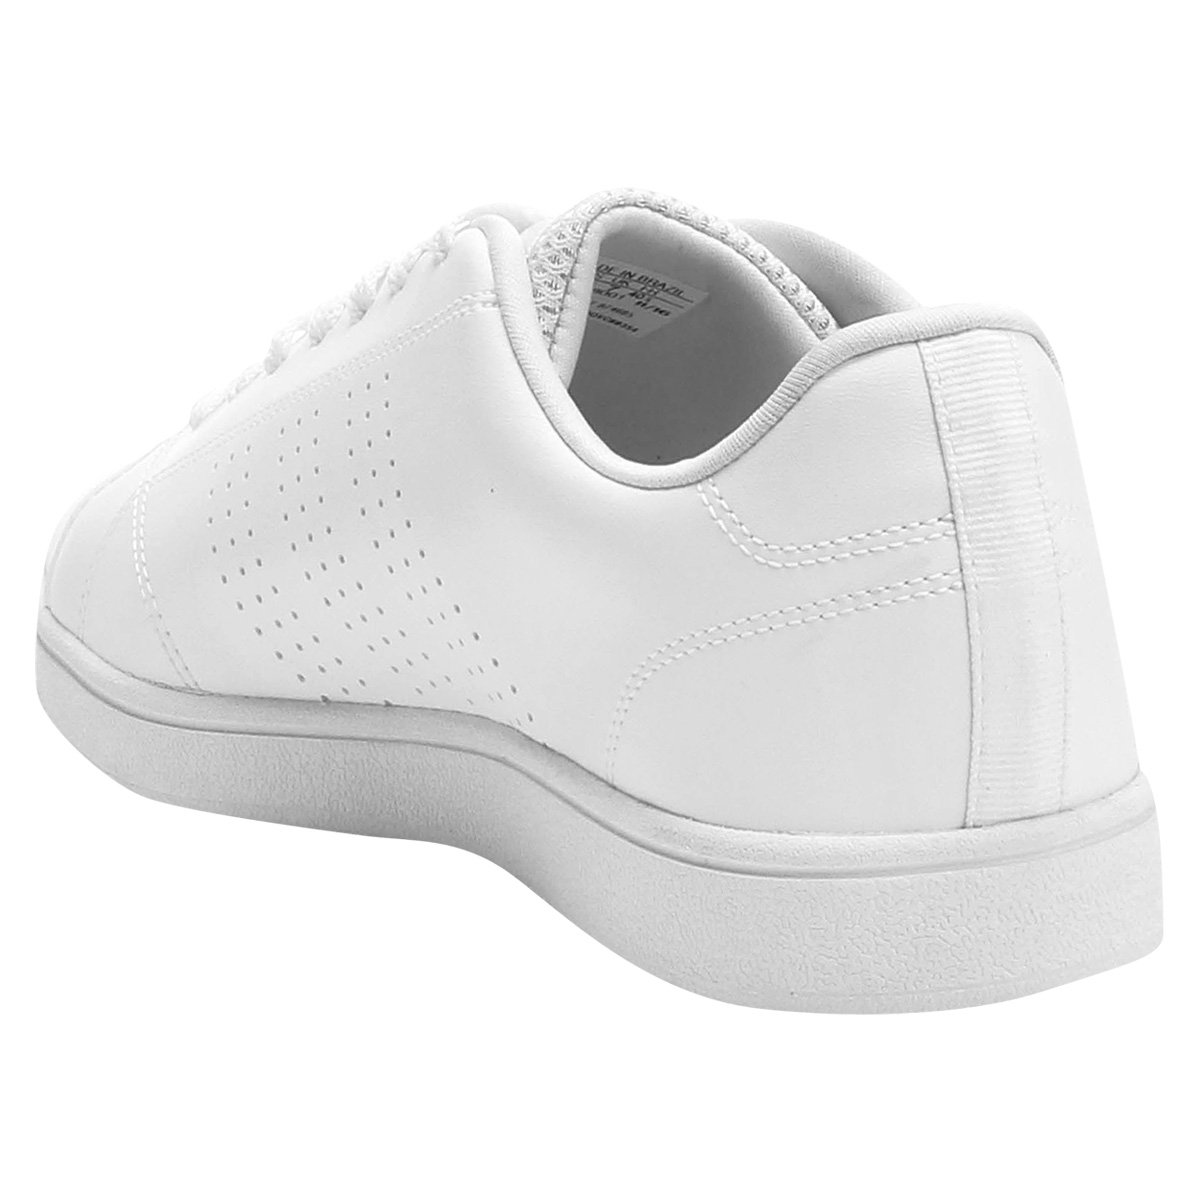 8670f96c5 Tênis Adidas Vs Advantage Clean Masculino - Tam: 40 - Shopping TudoAzul